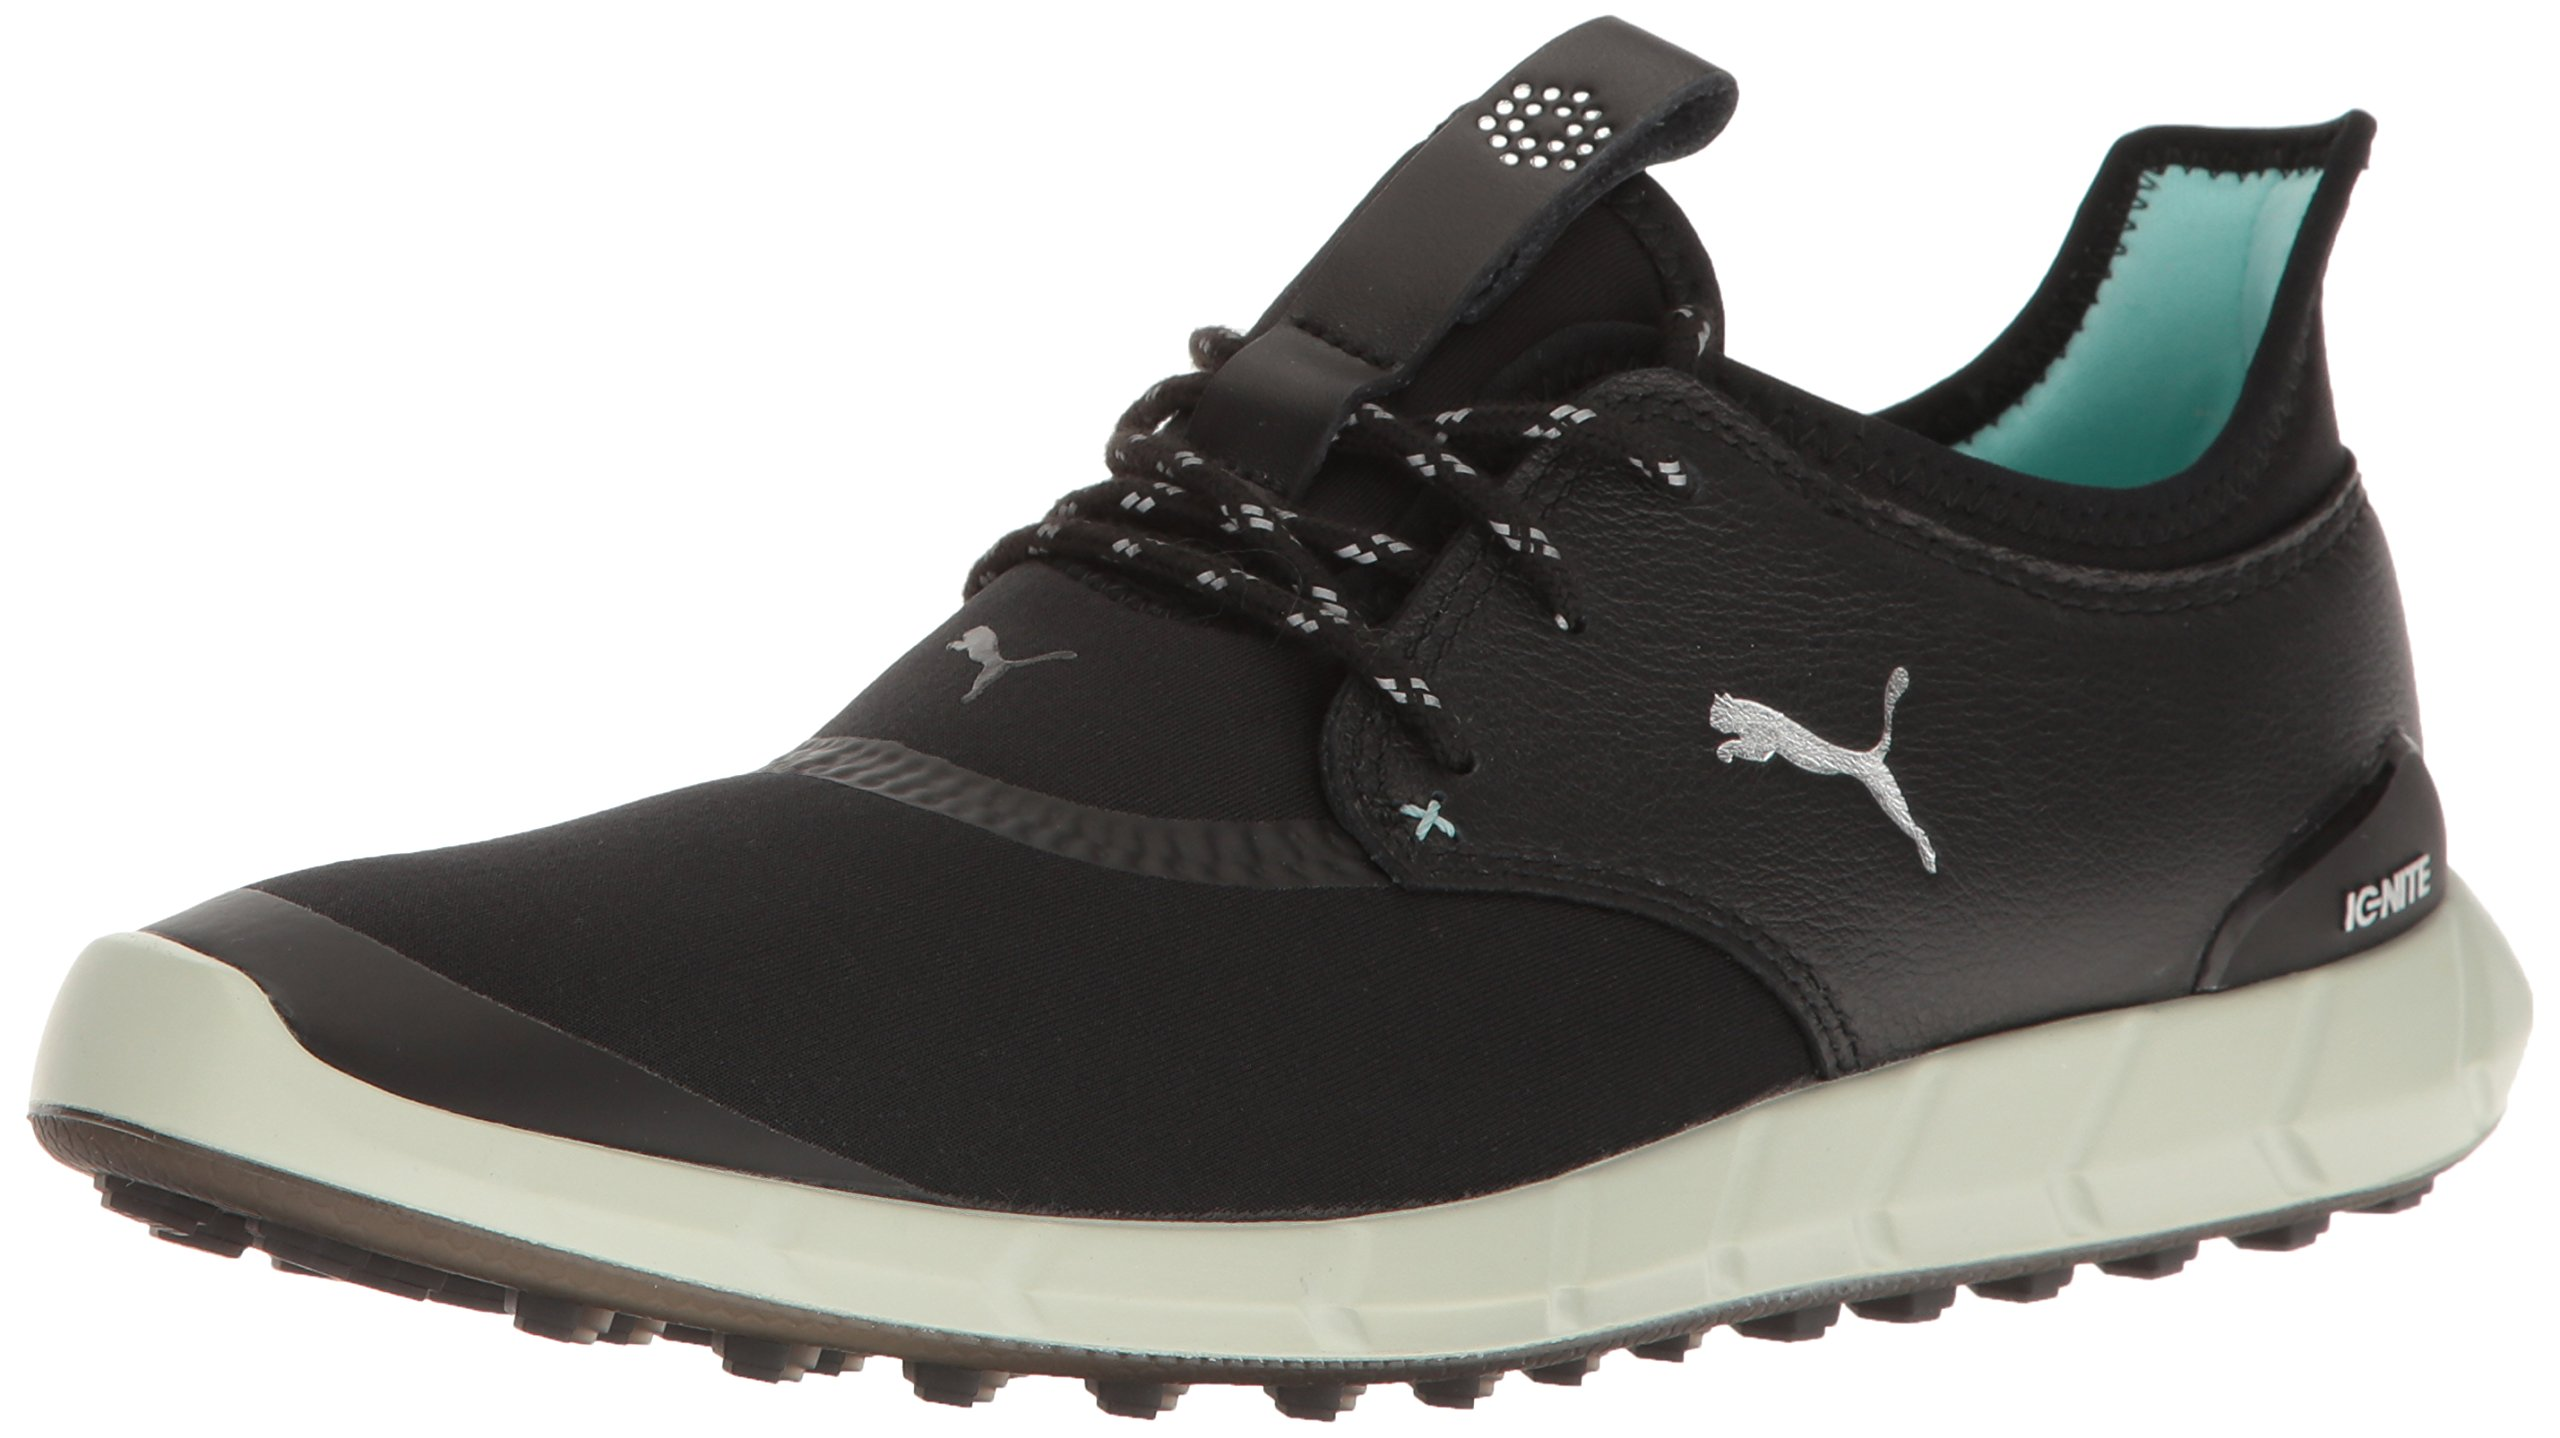 PUMA Women's Ignite Spikeless Sport Wmns Golf Shoe, Black Silver-Aruba Blue, 5.5 Medium US